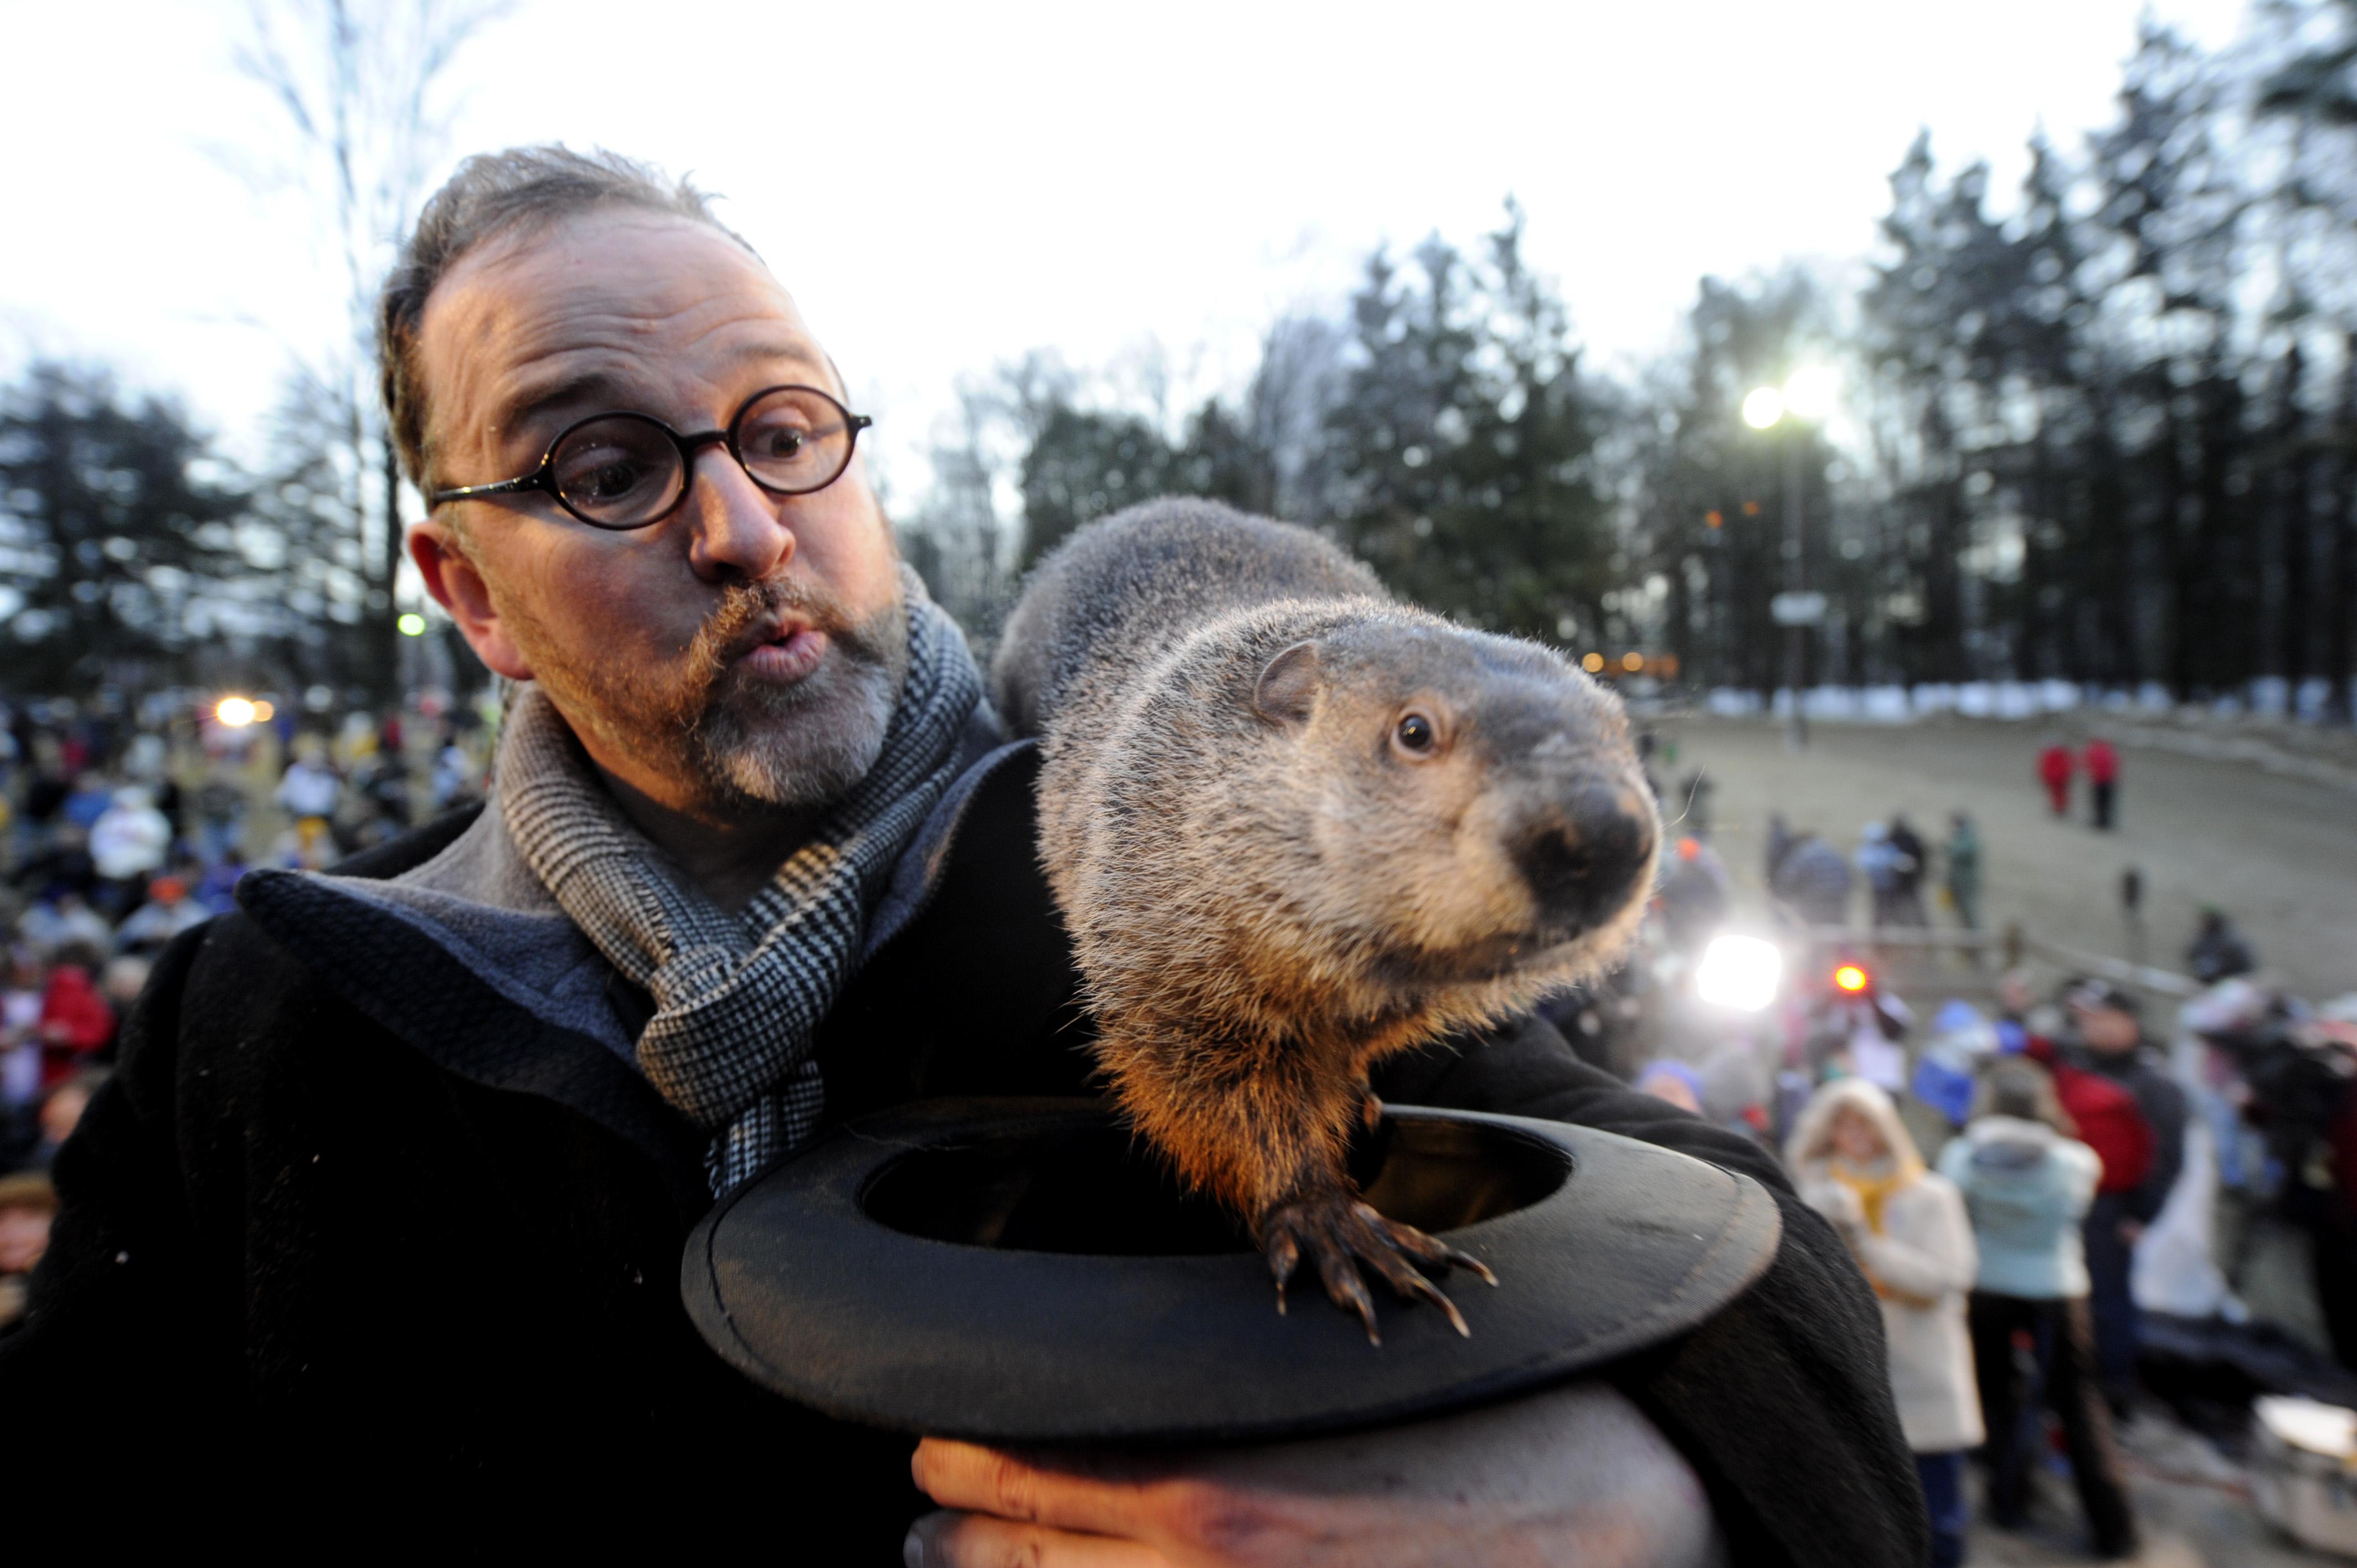 Crowds Gathering On Groundhog's Day For Punxsutawney Phil Tradition